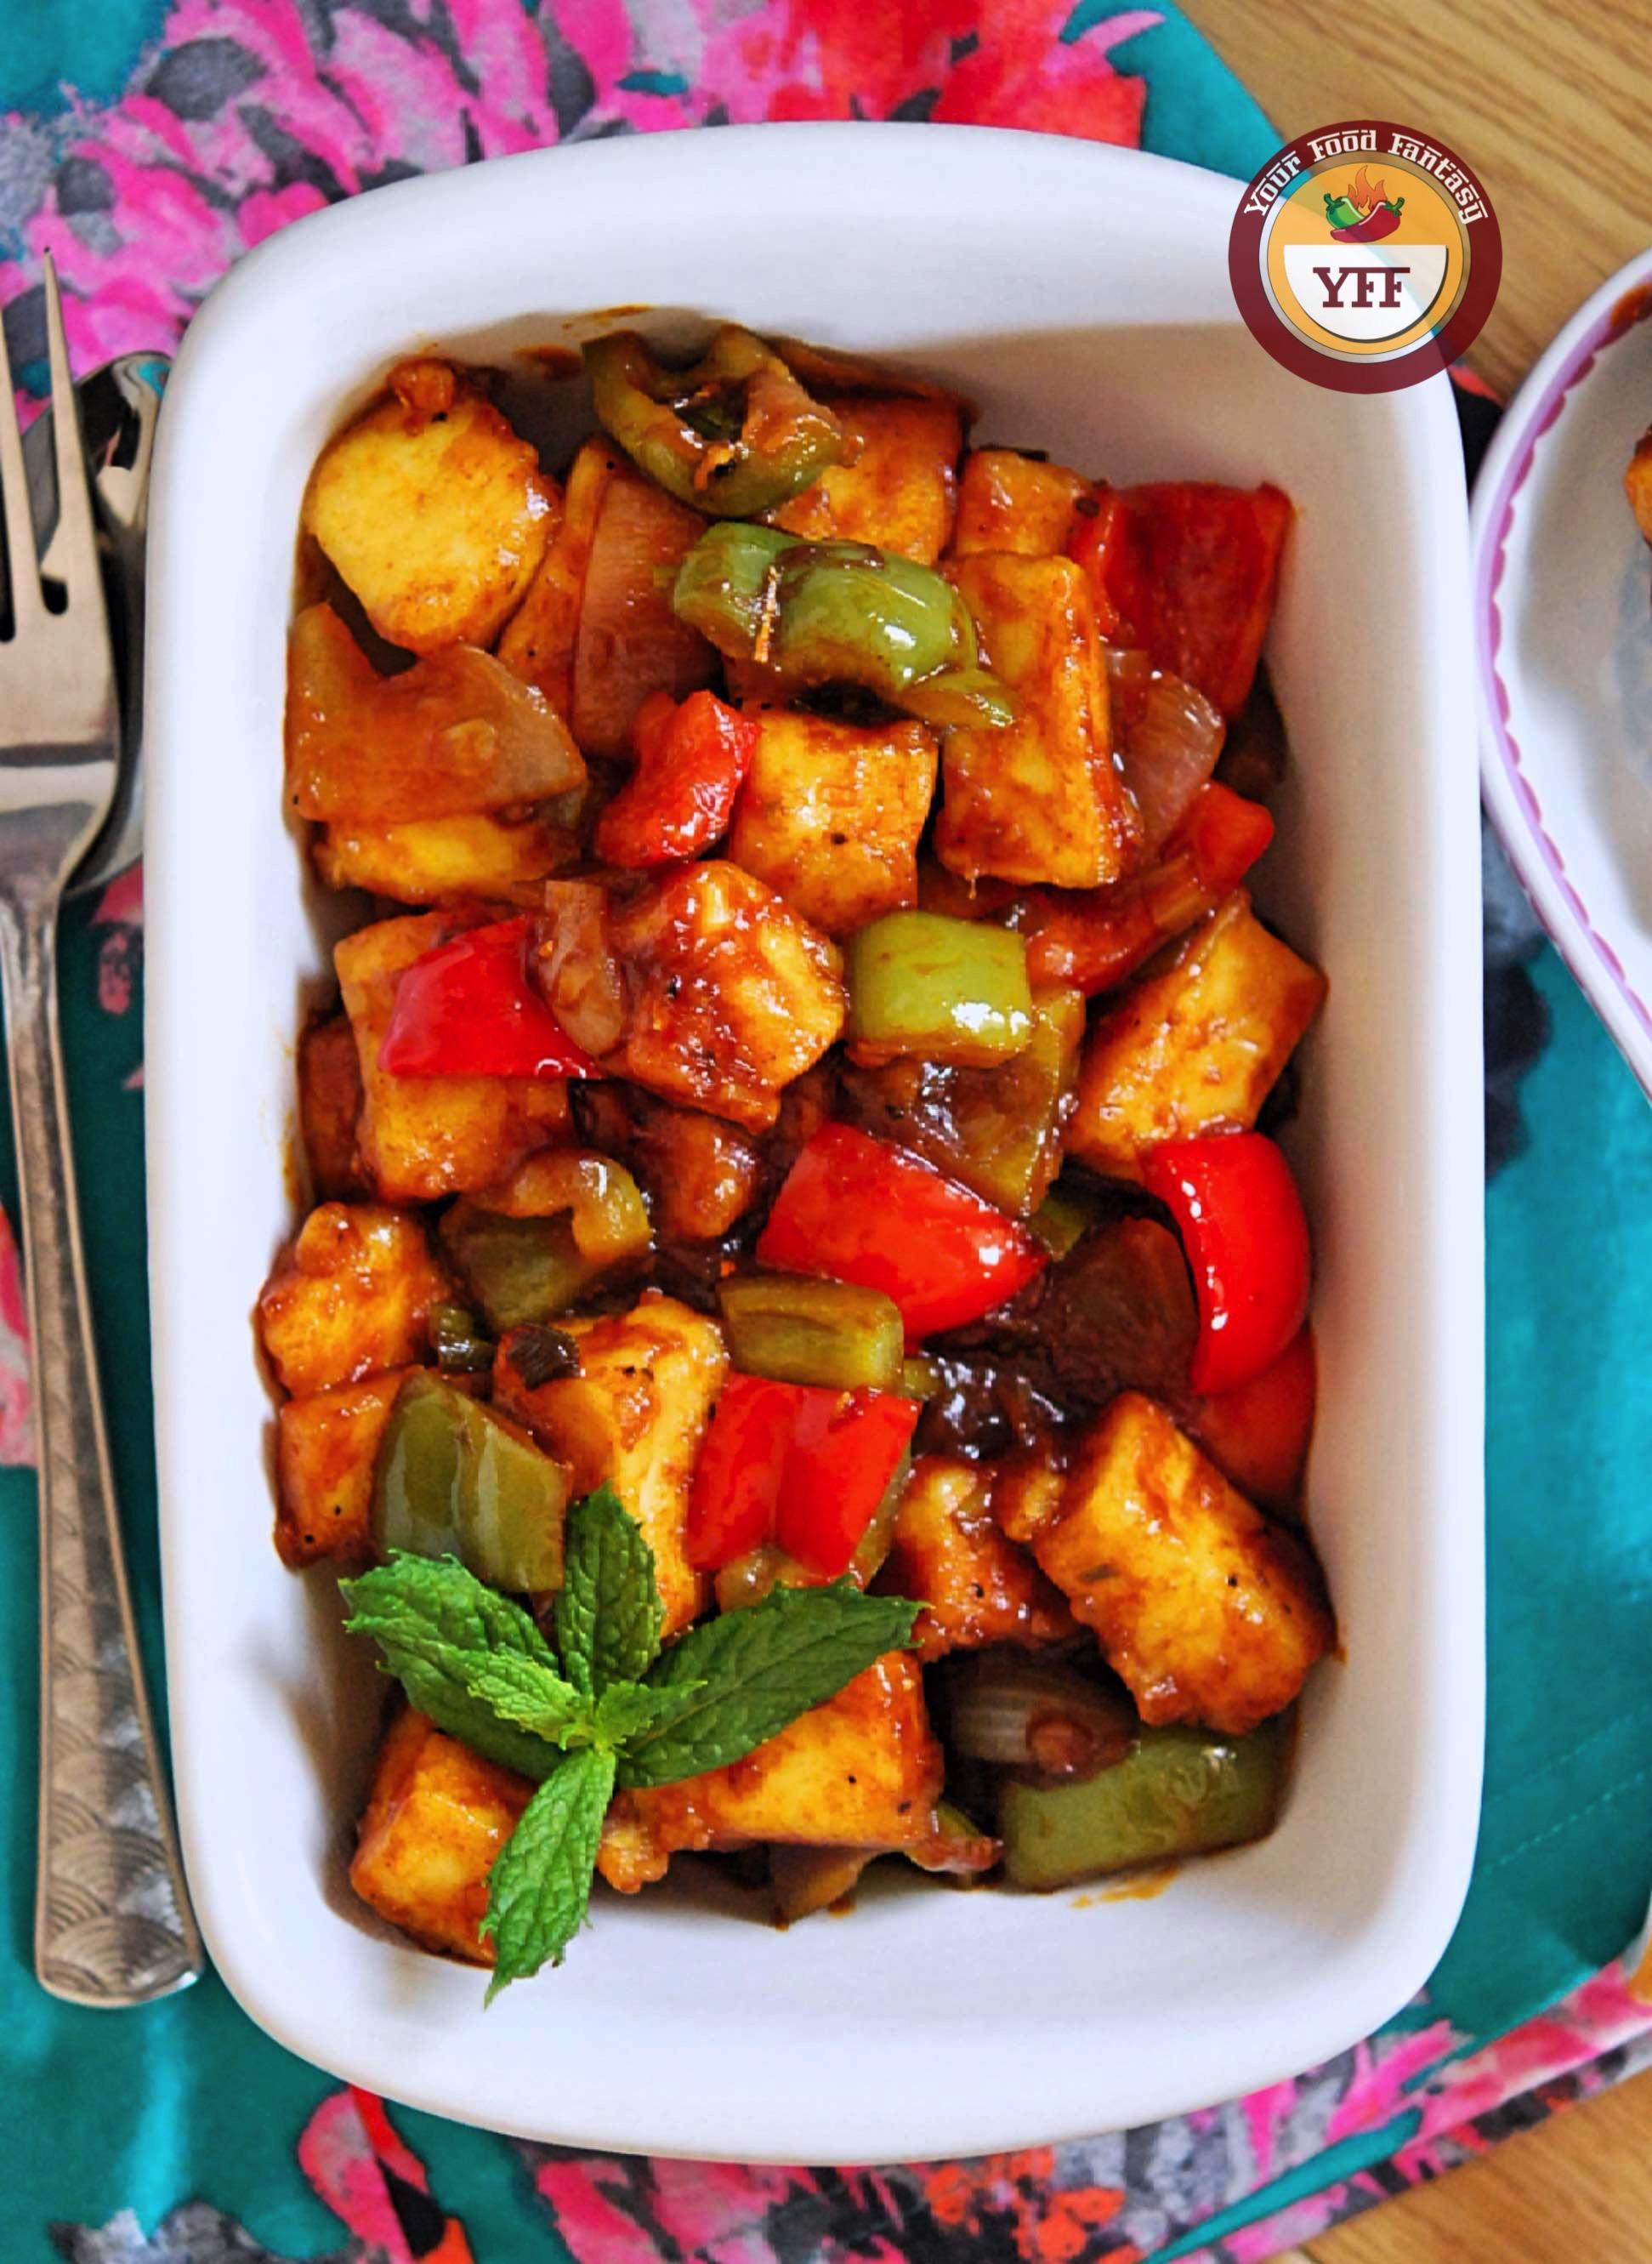 Chilli Paneer Recipe - Your Food Fantasy